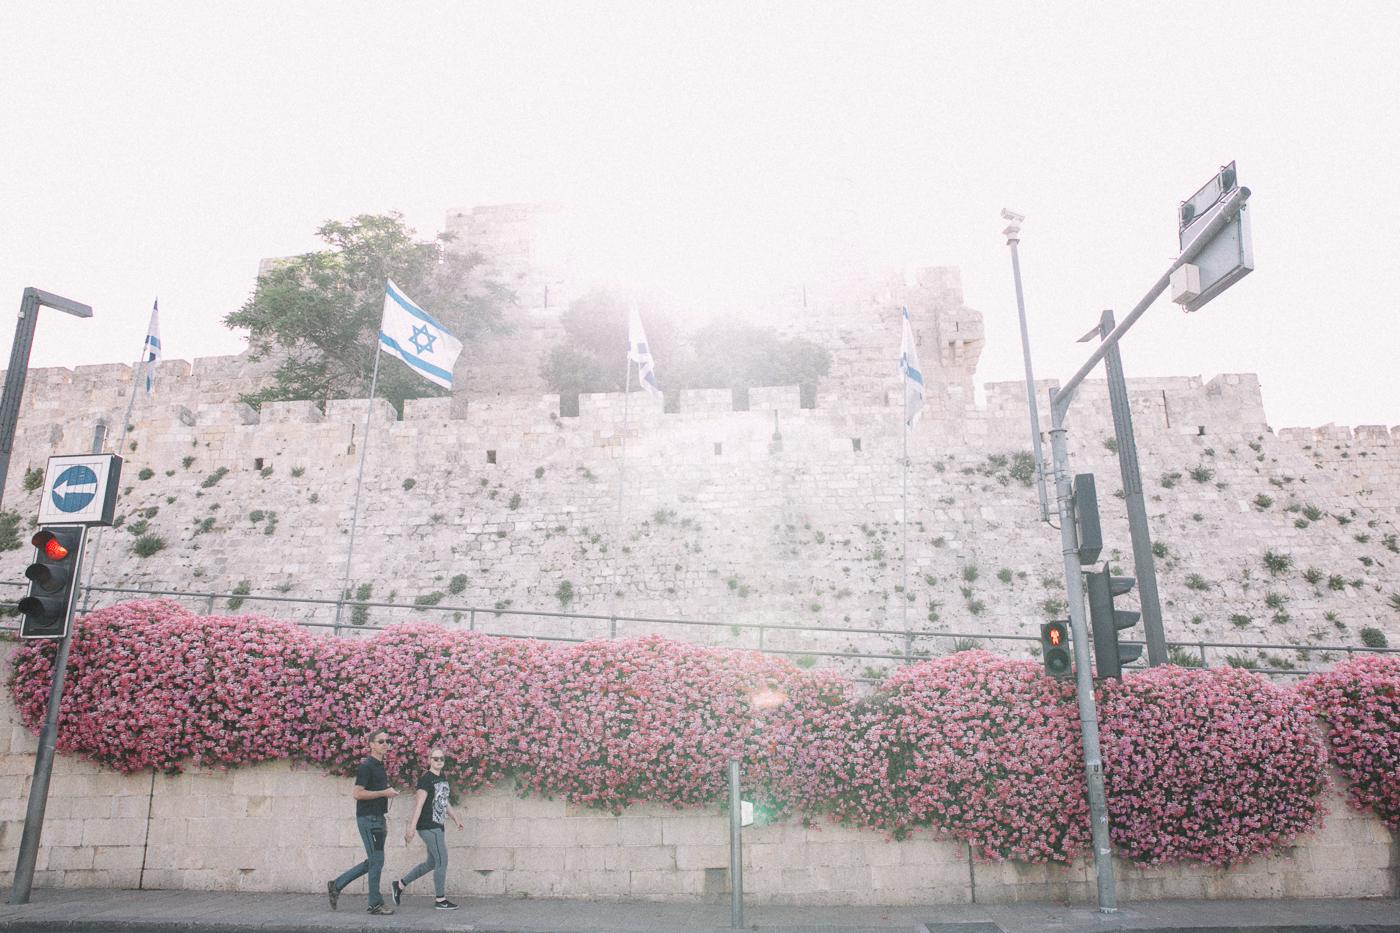 Tel Aviv Travel Guide - Bikinis & Passports